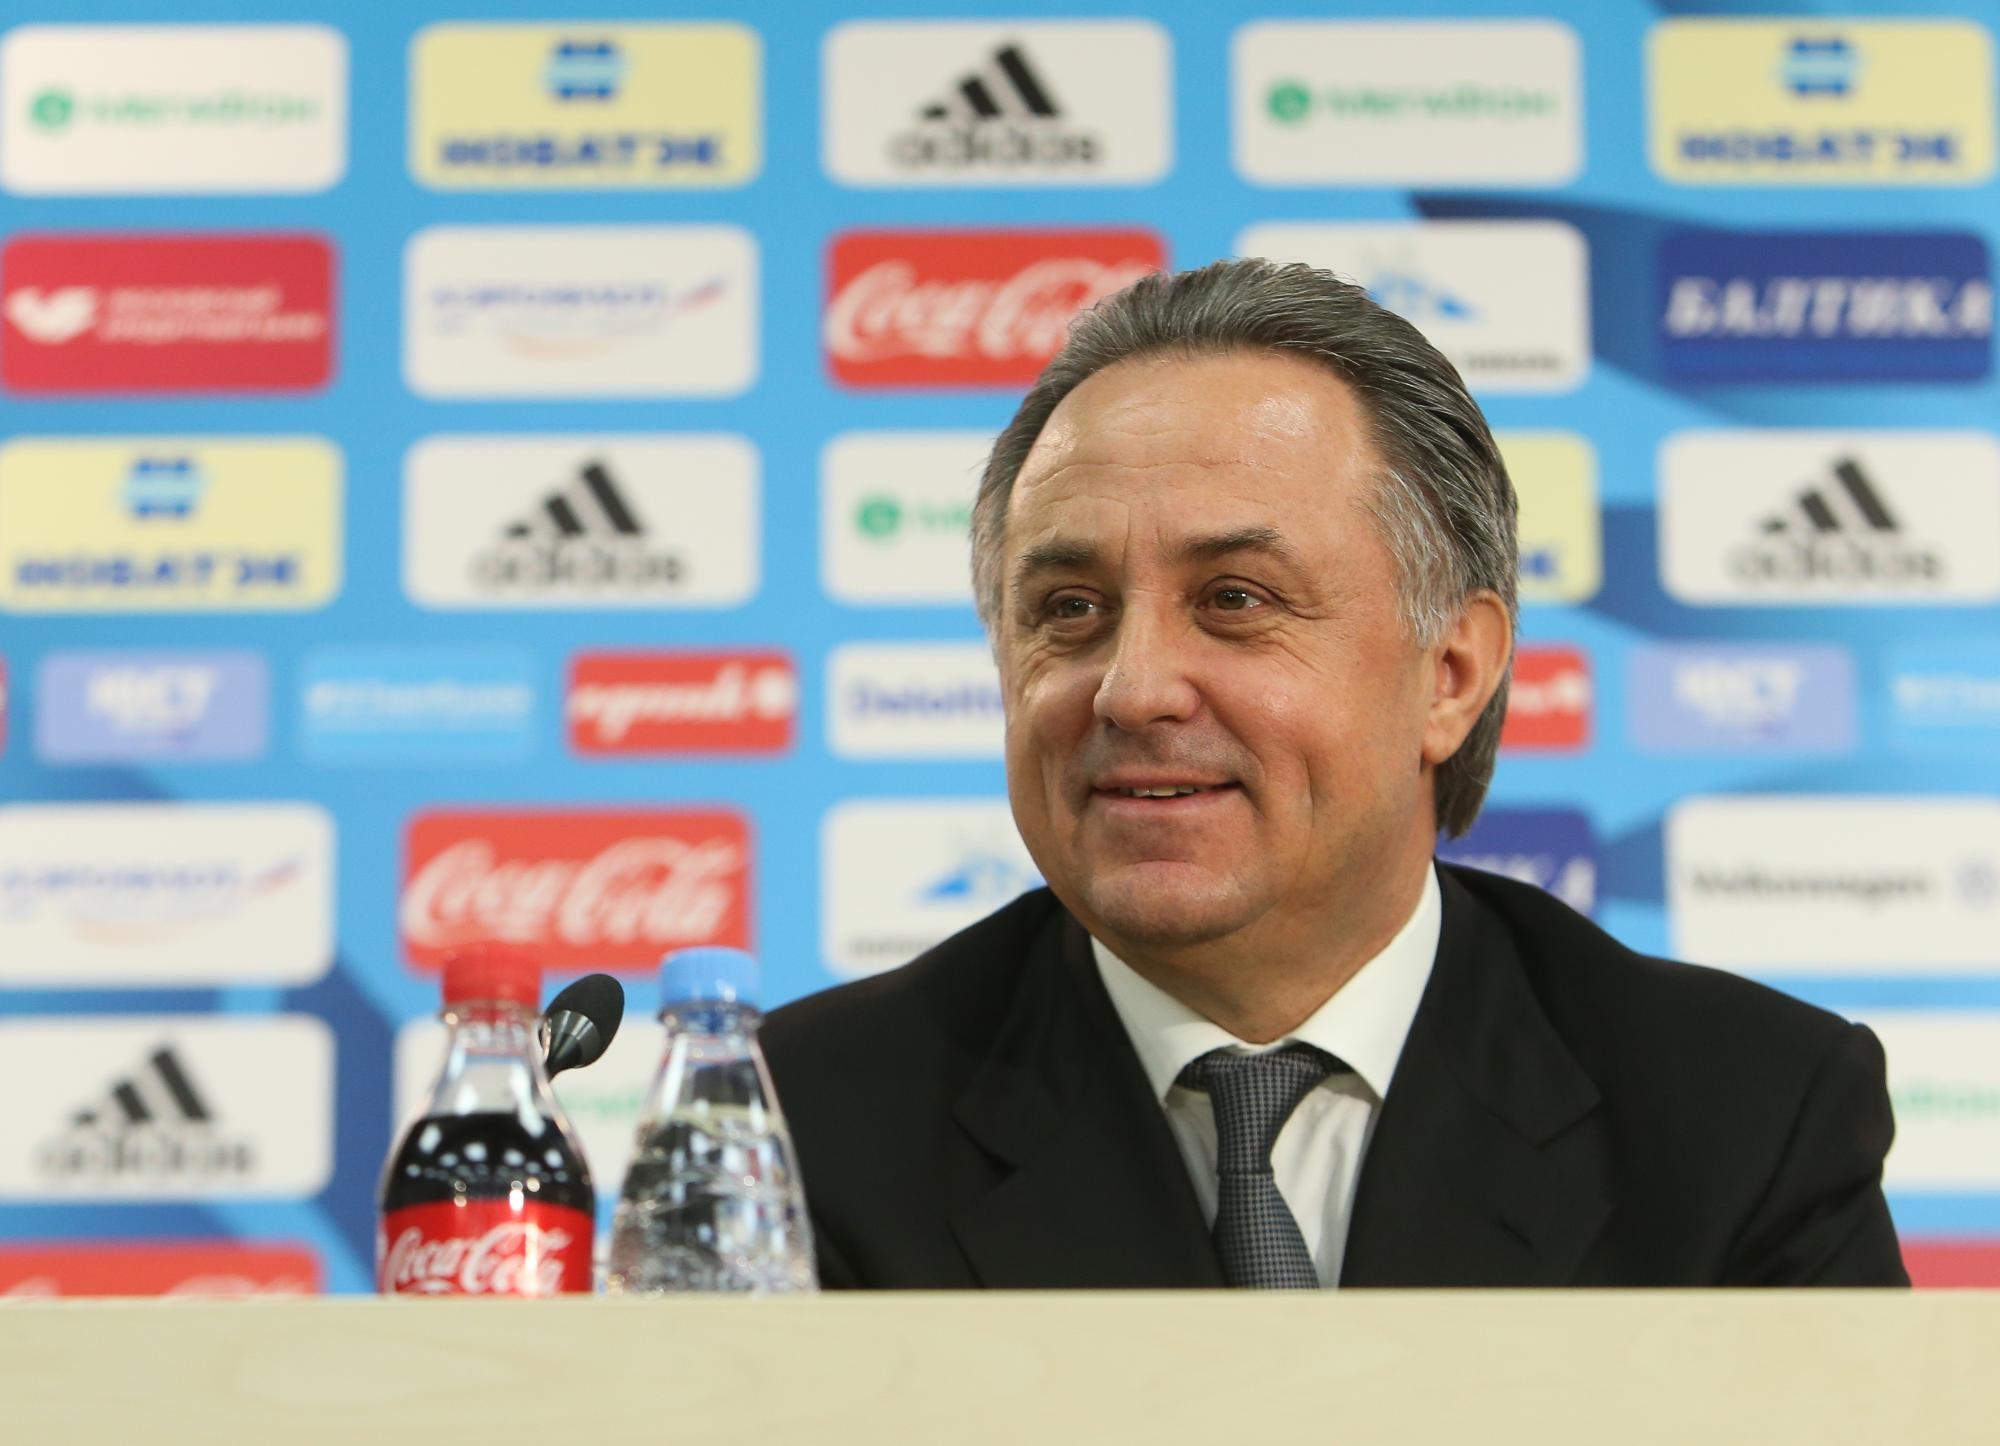 УЕФА включил Мутко всписок претендентов всовет ФИФА